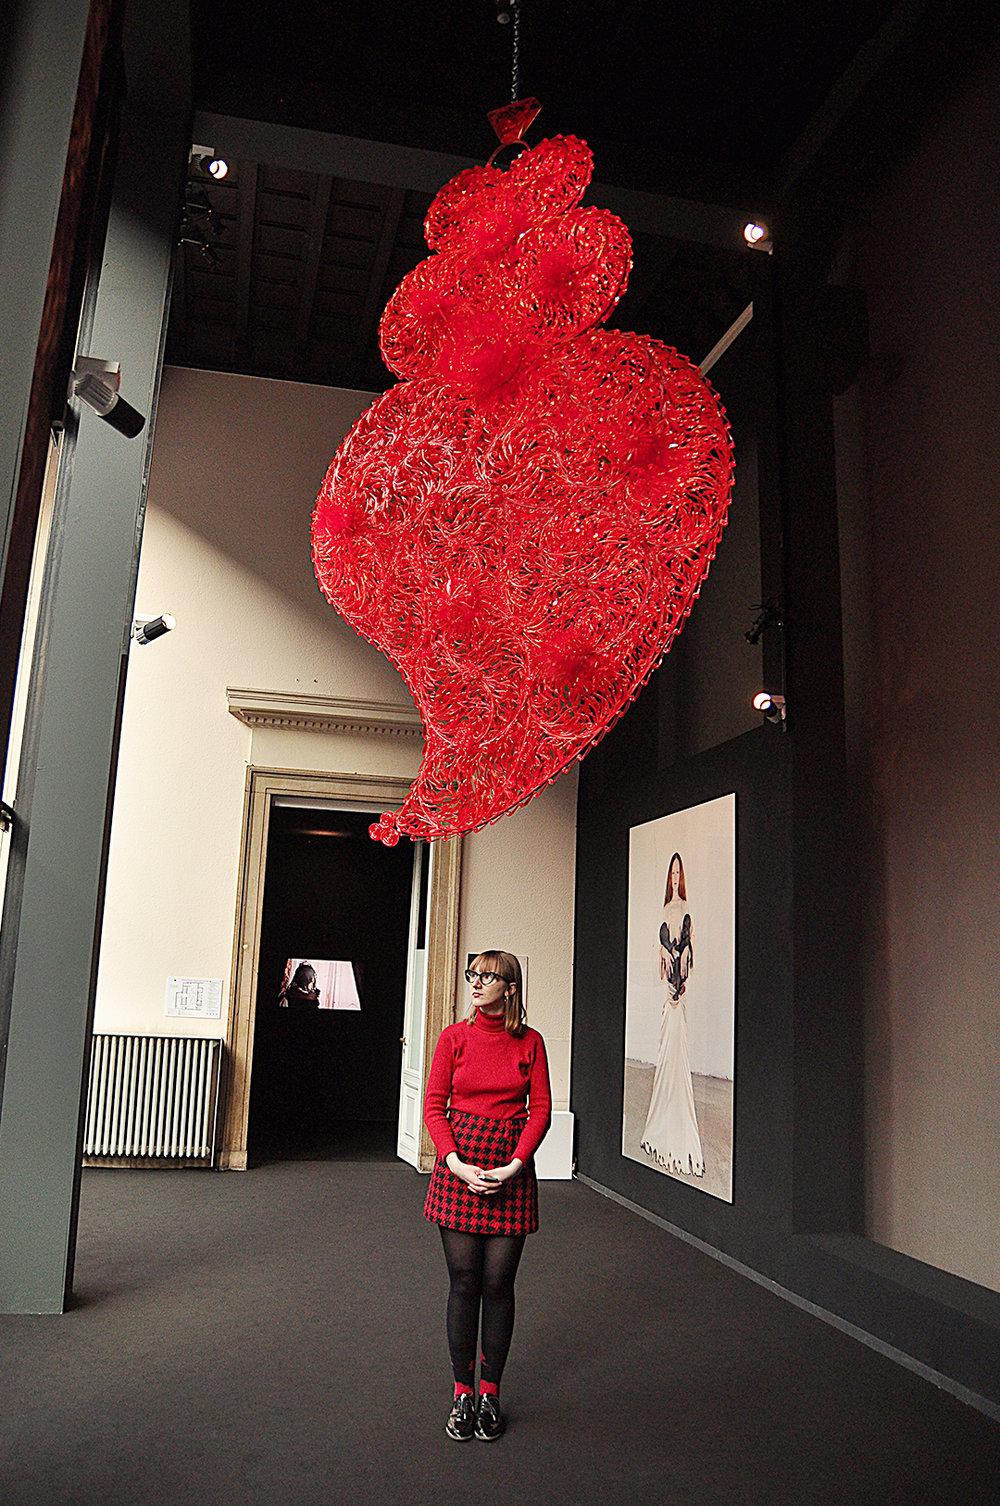 Joana Vasconcelos. Inedependent Heart